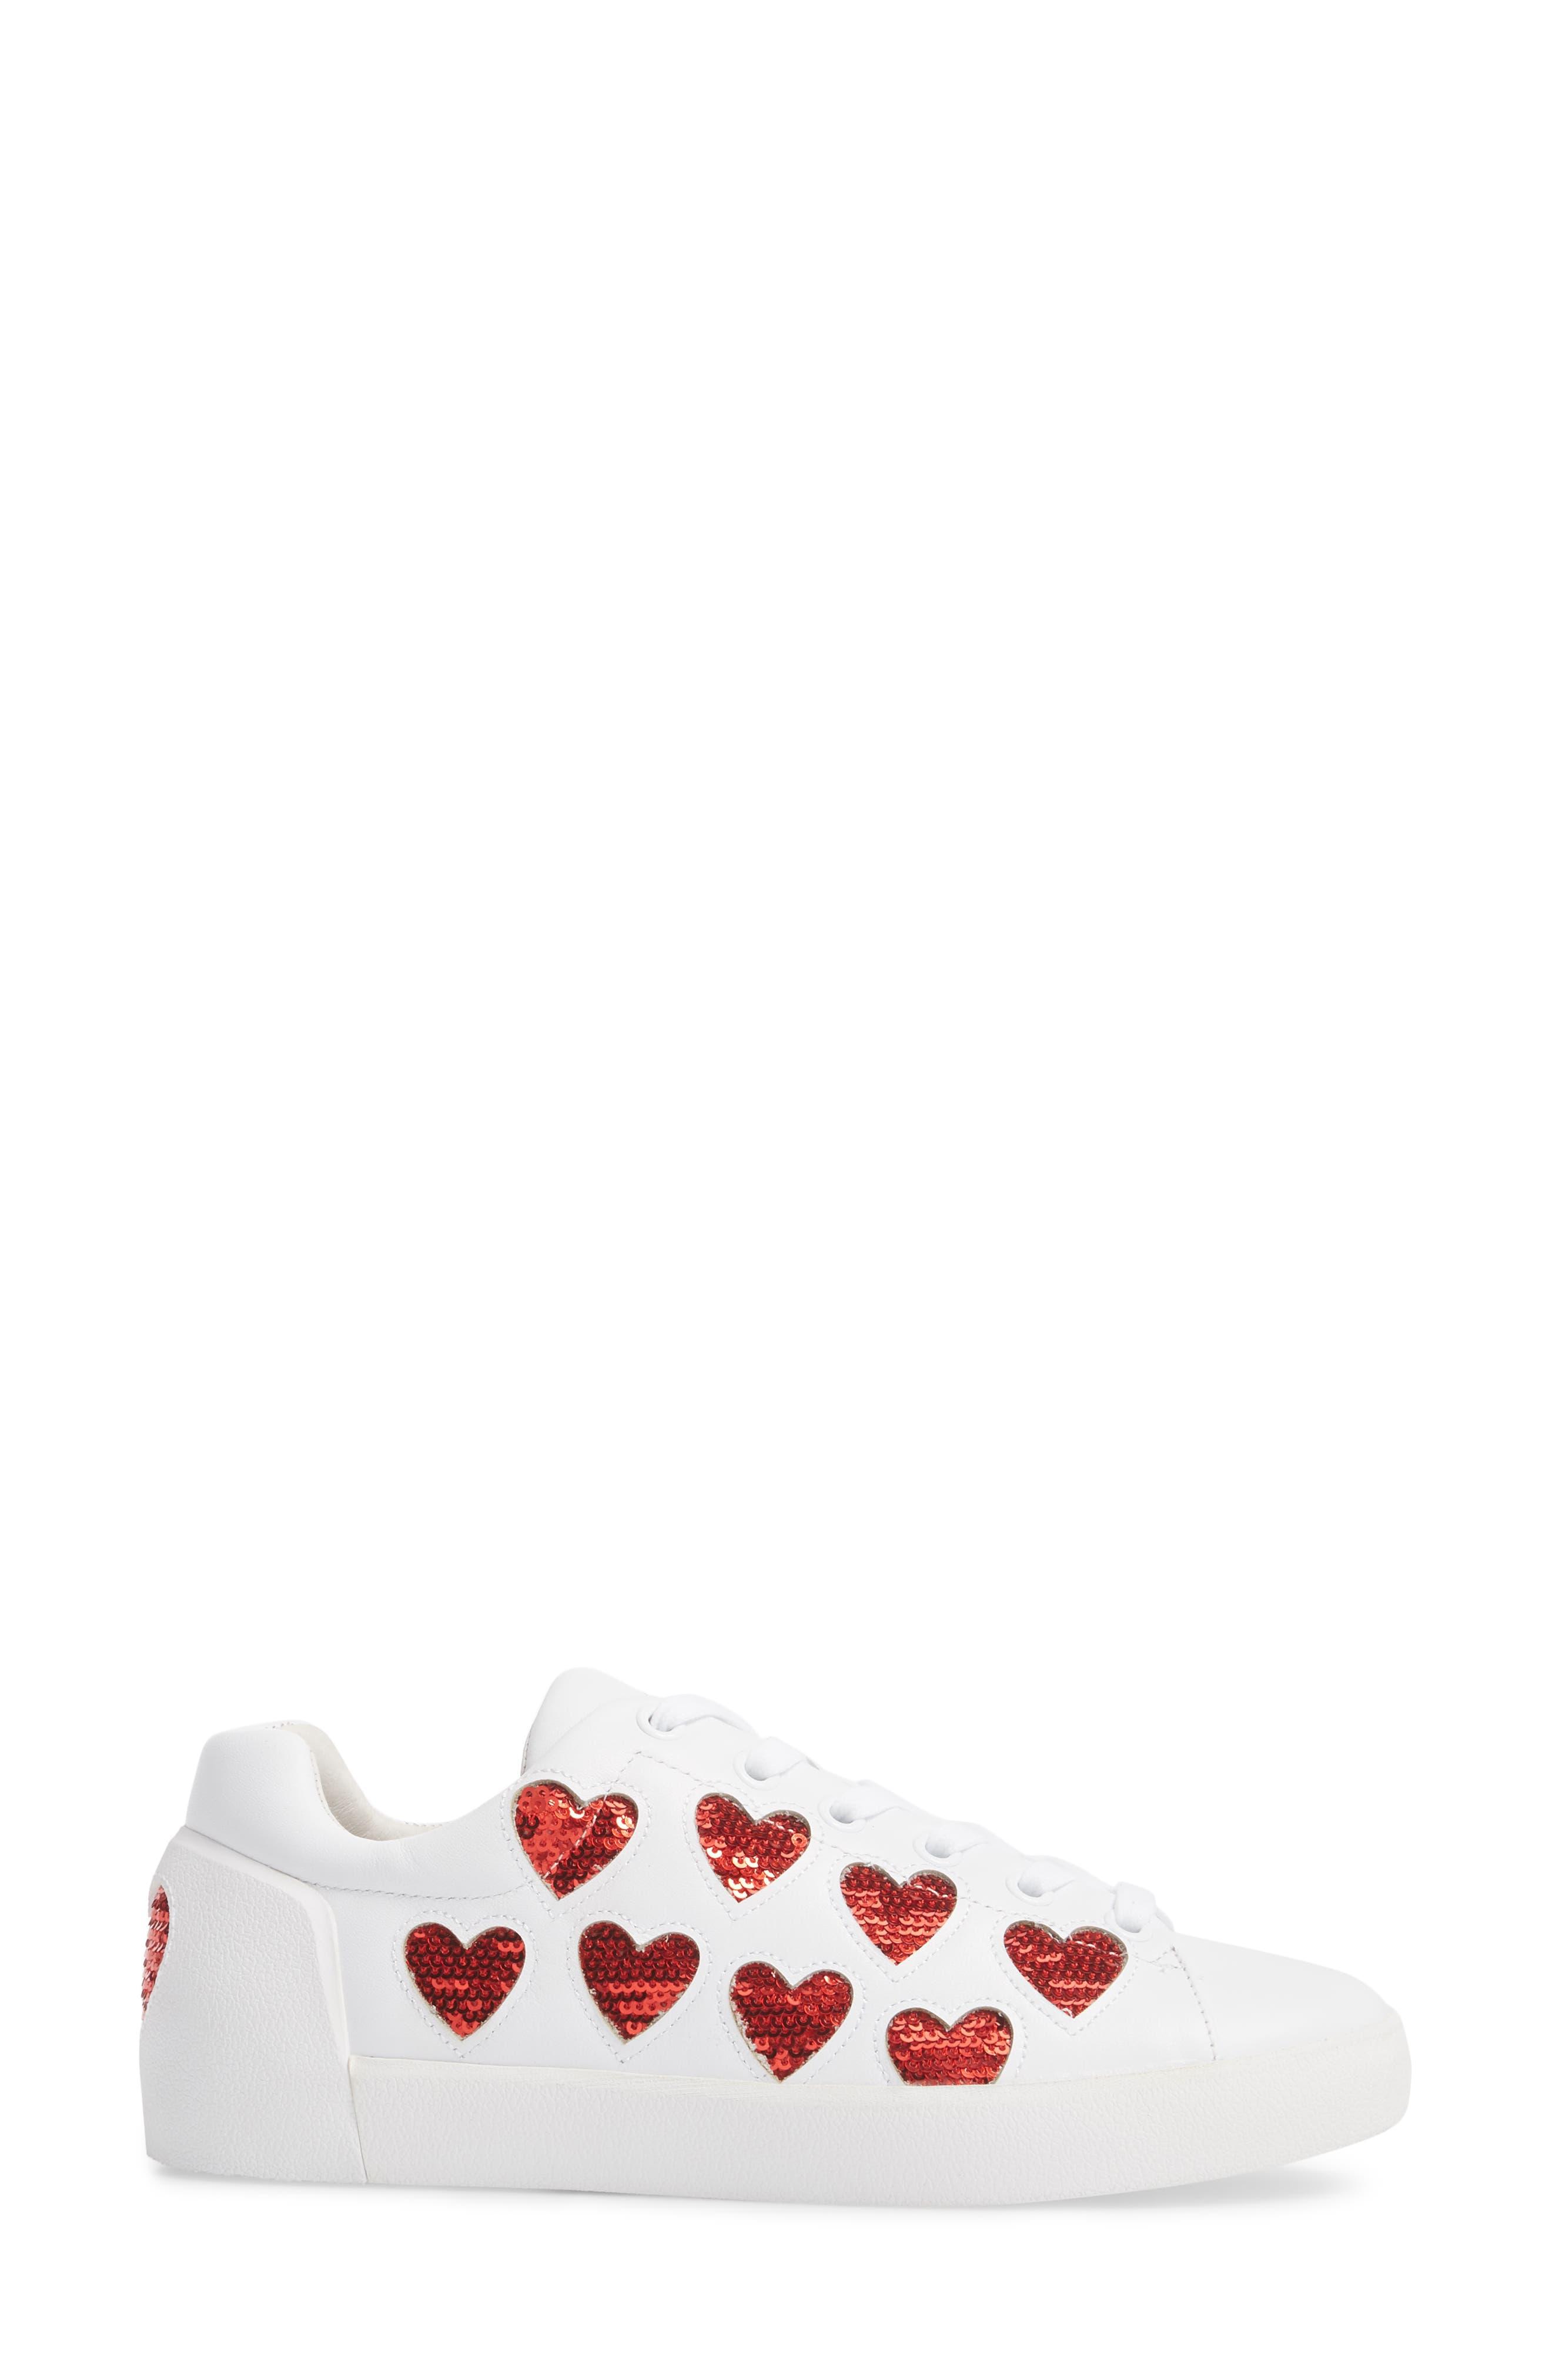 Nikita Sneaker,                             Alternate thumbnail 3, color,                             White/ Red